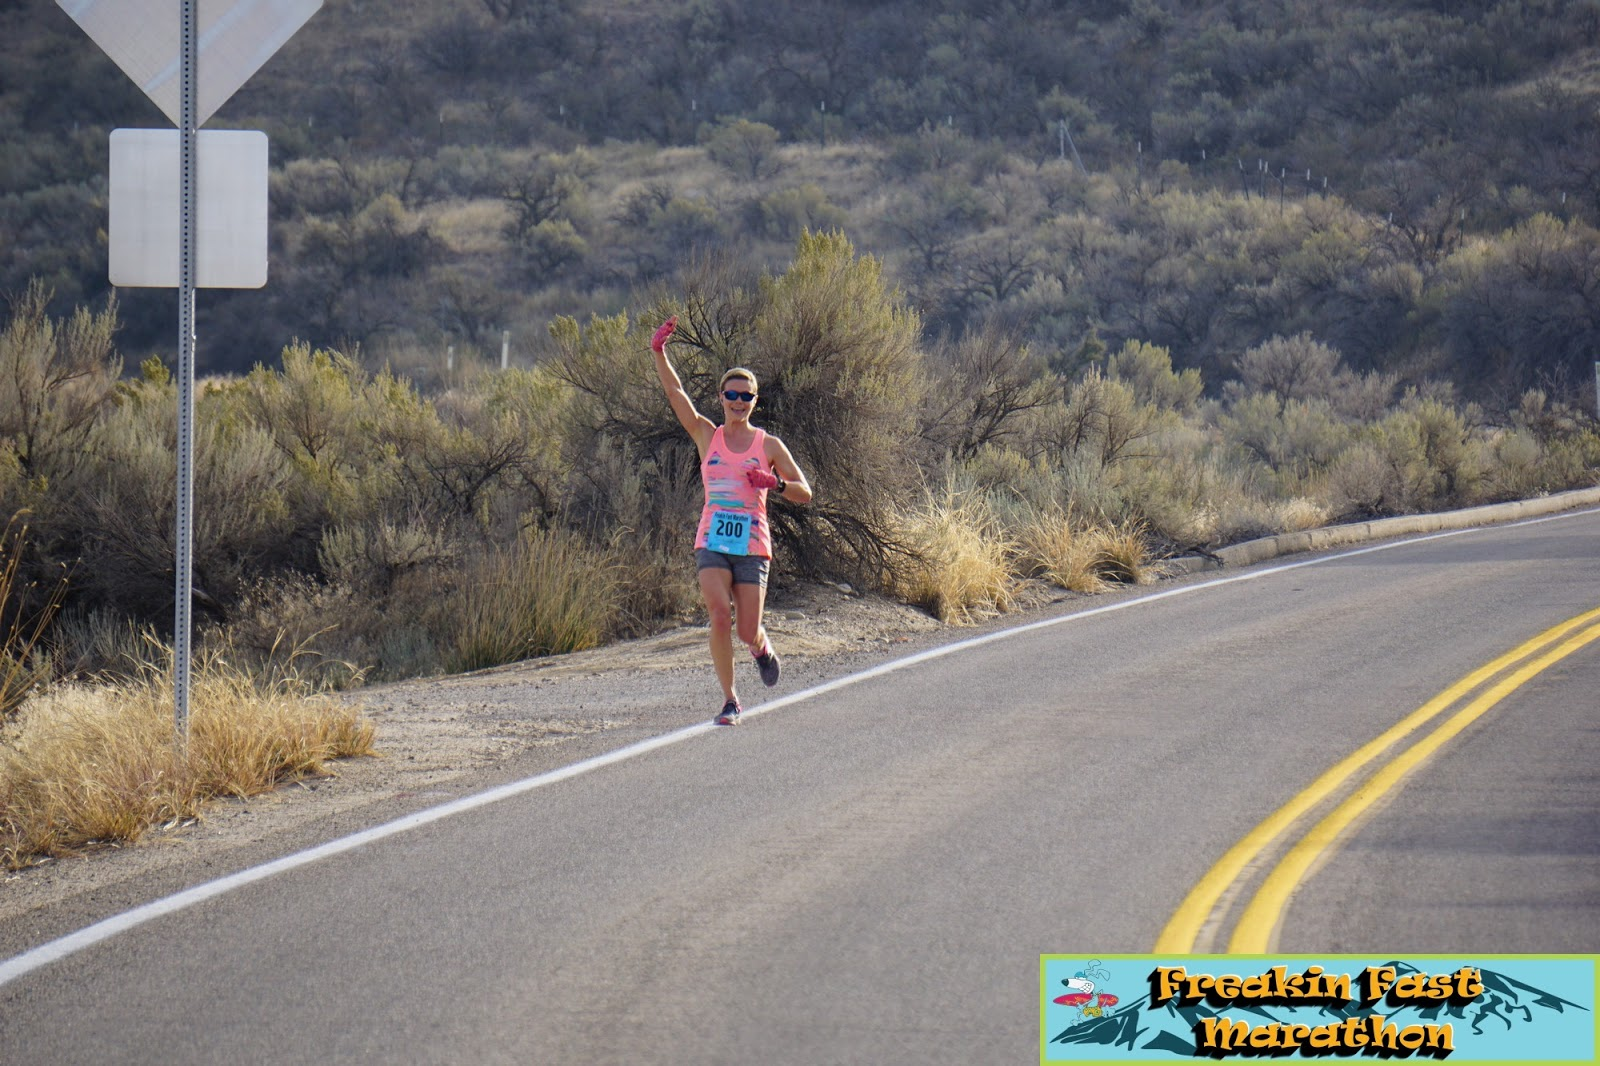 Freakin Fast Marathon, Fastest Marathon in the World, Marathon in Boise, Downhill Marathon, Boise Runner